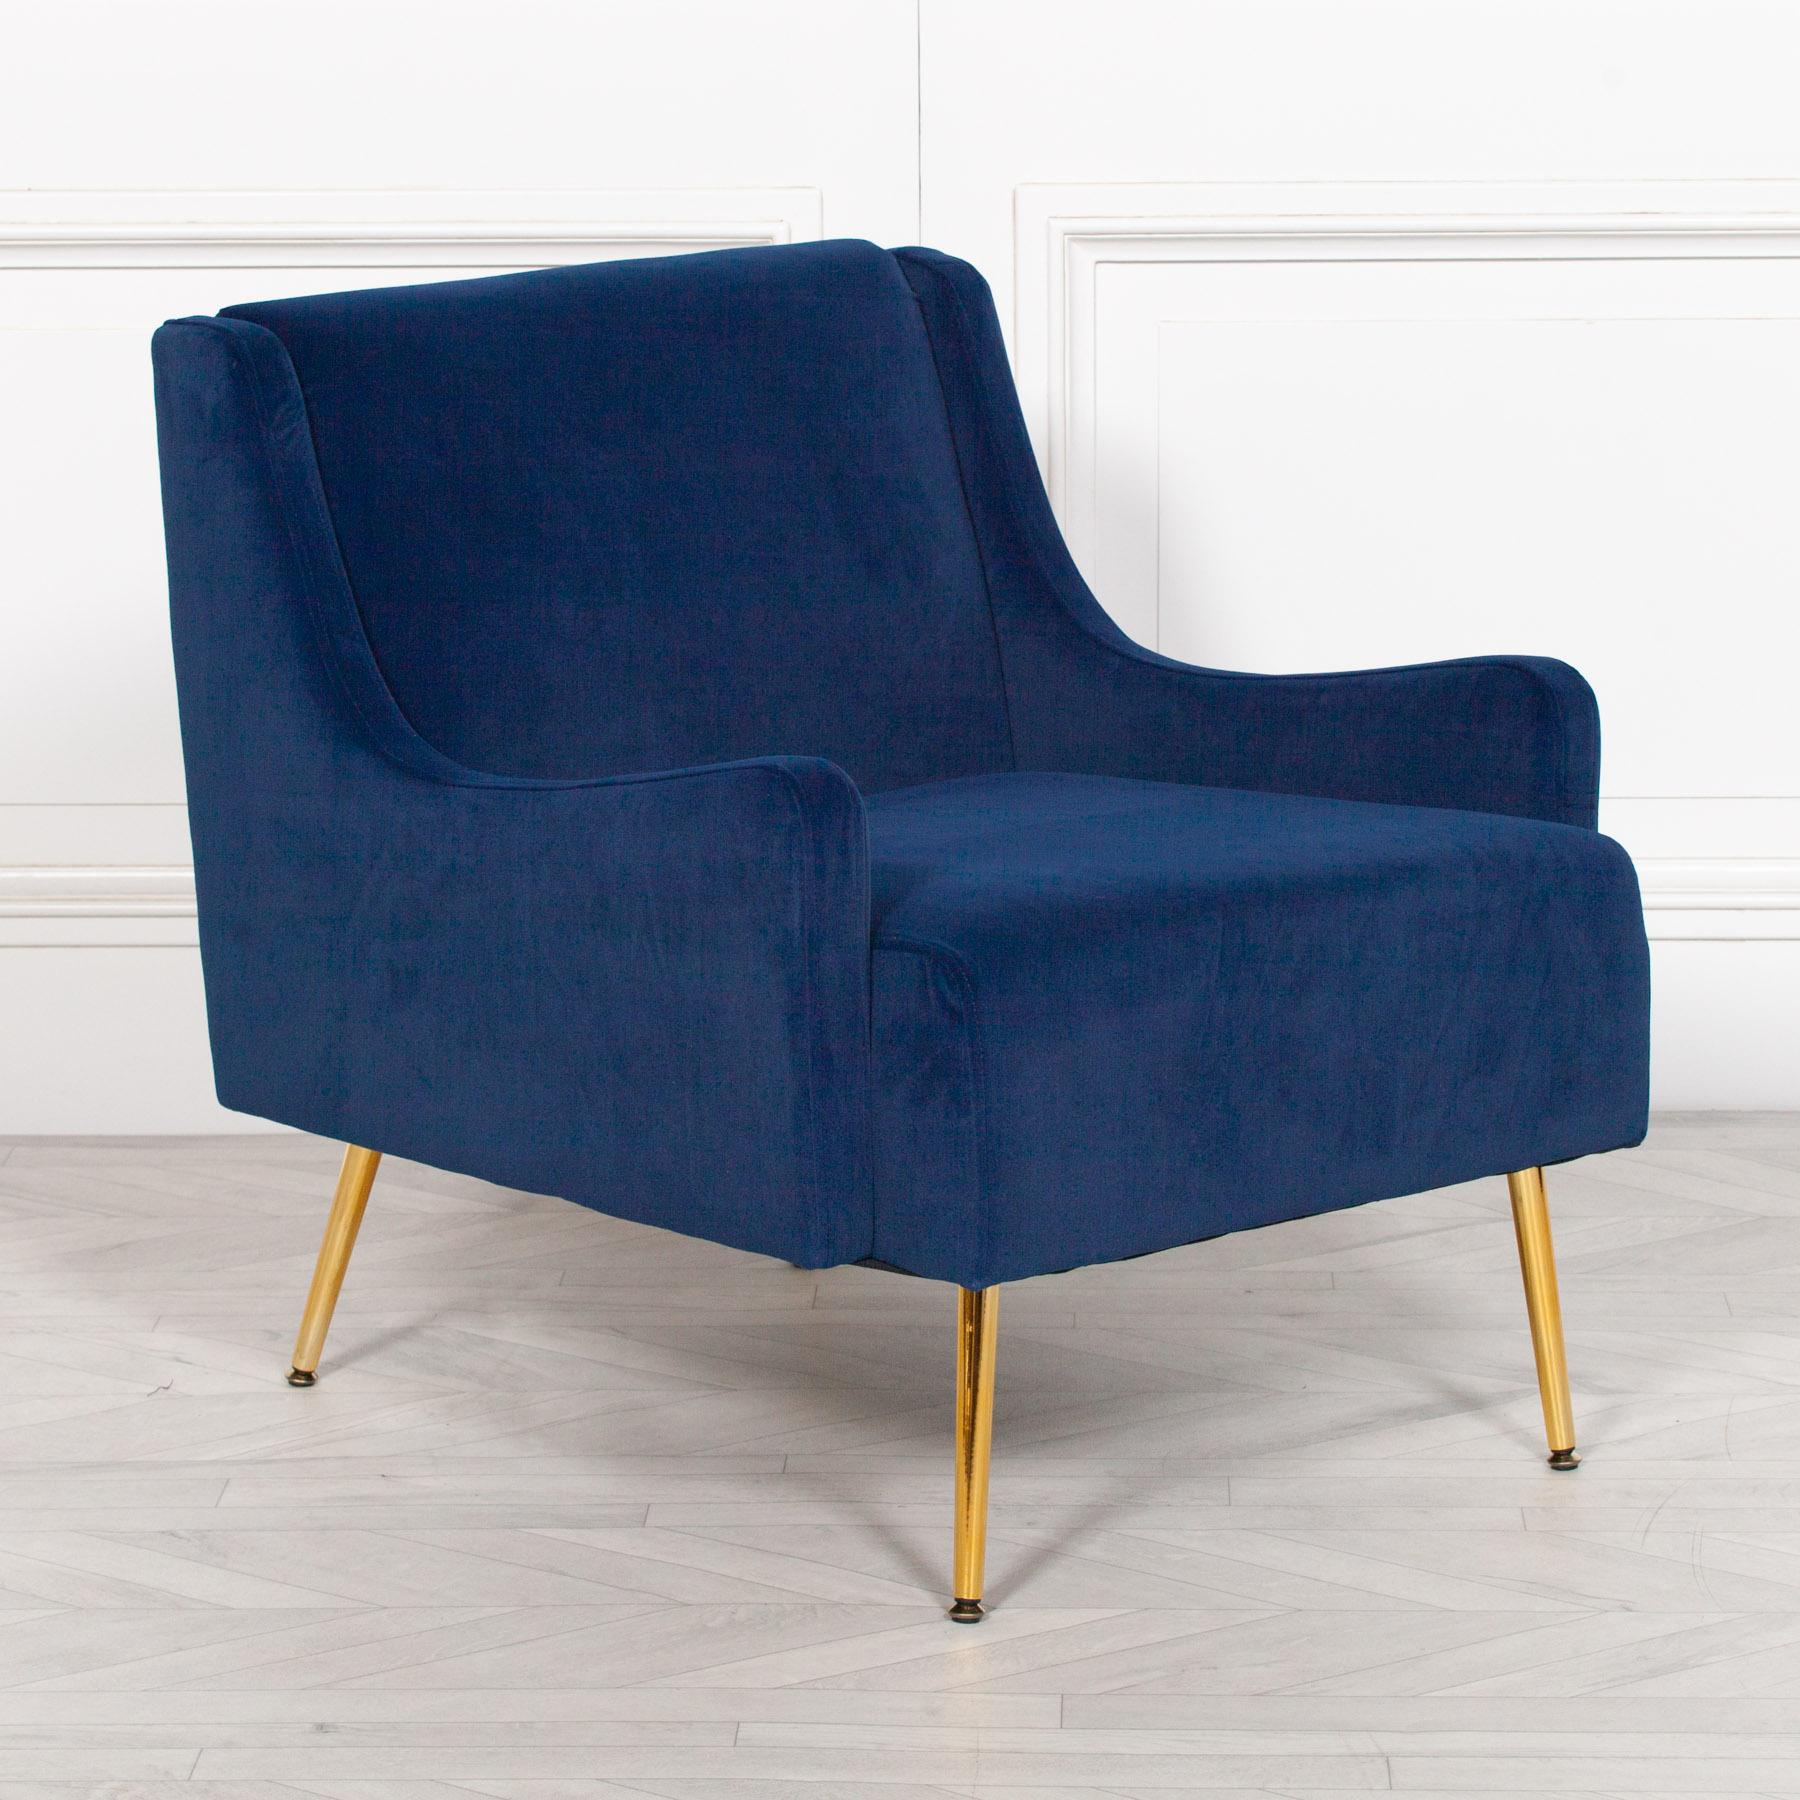 Picture of: Aurelie Navy Blue Velvet Sofa Chair Furniture La Maison Chic Luxury Interiors